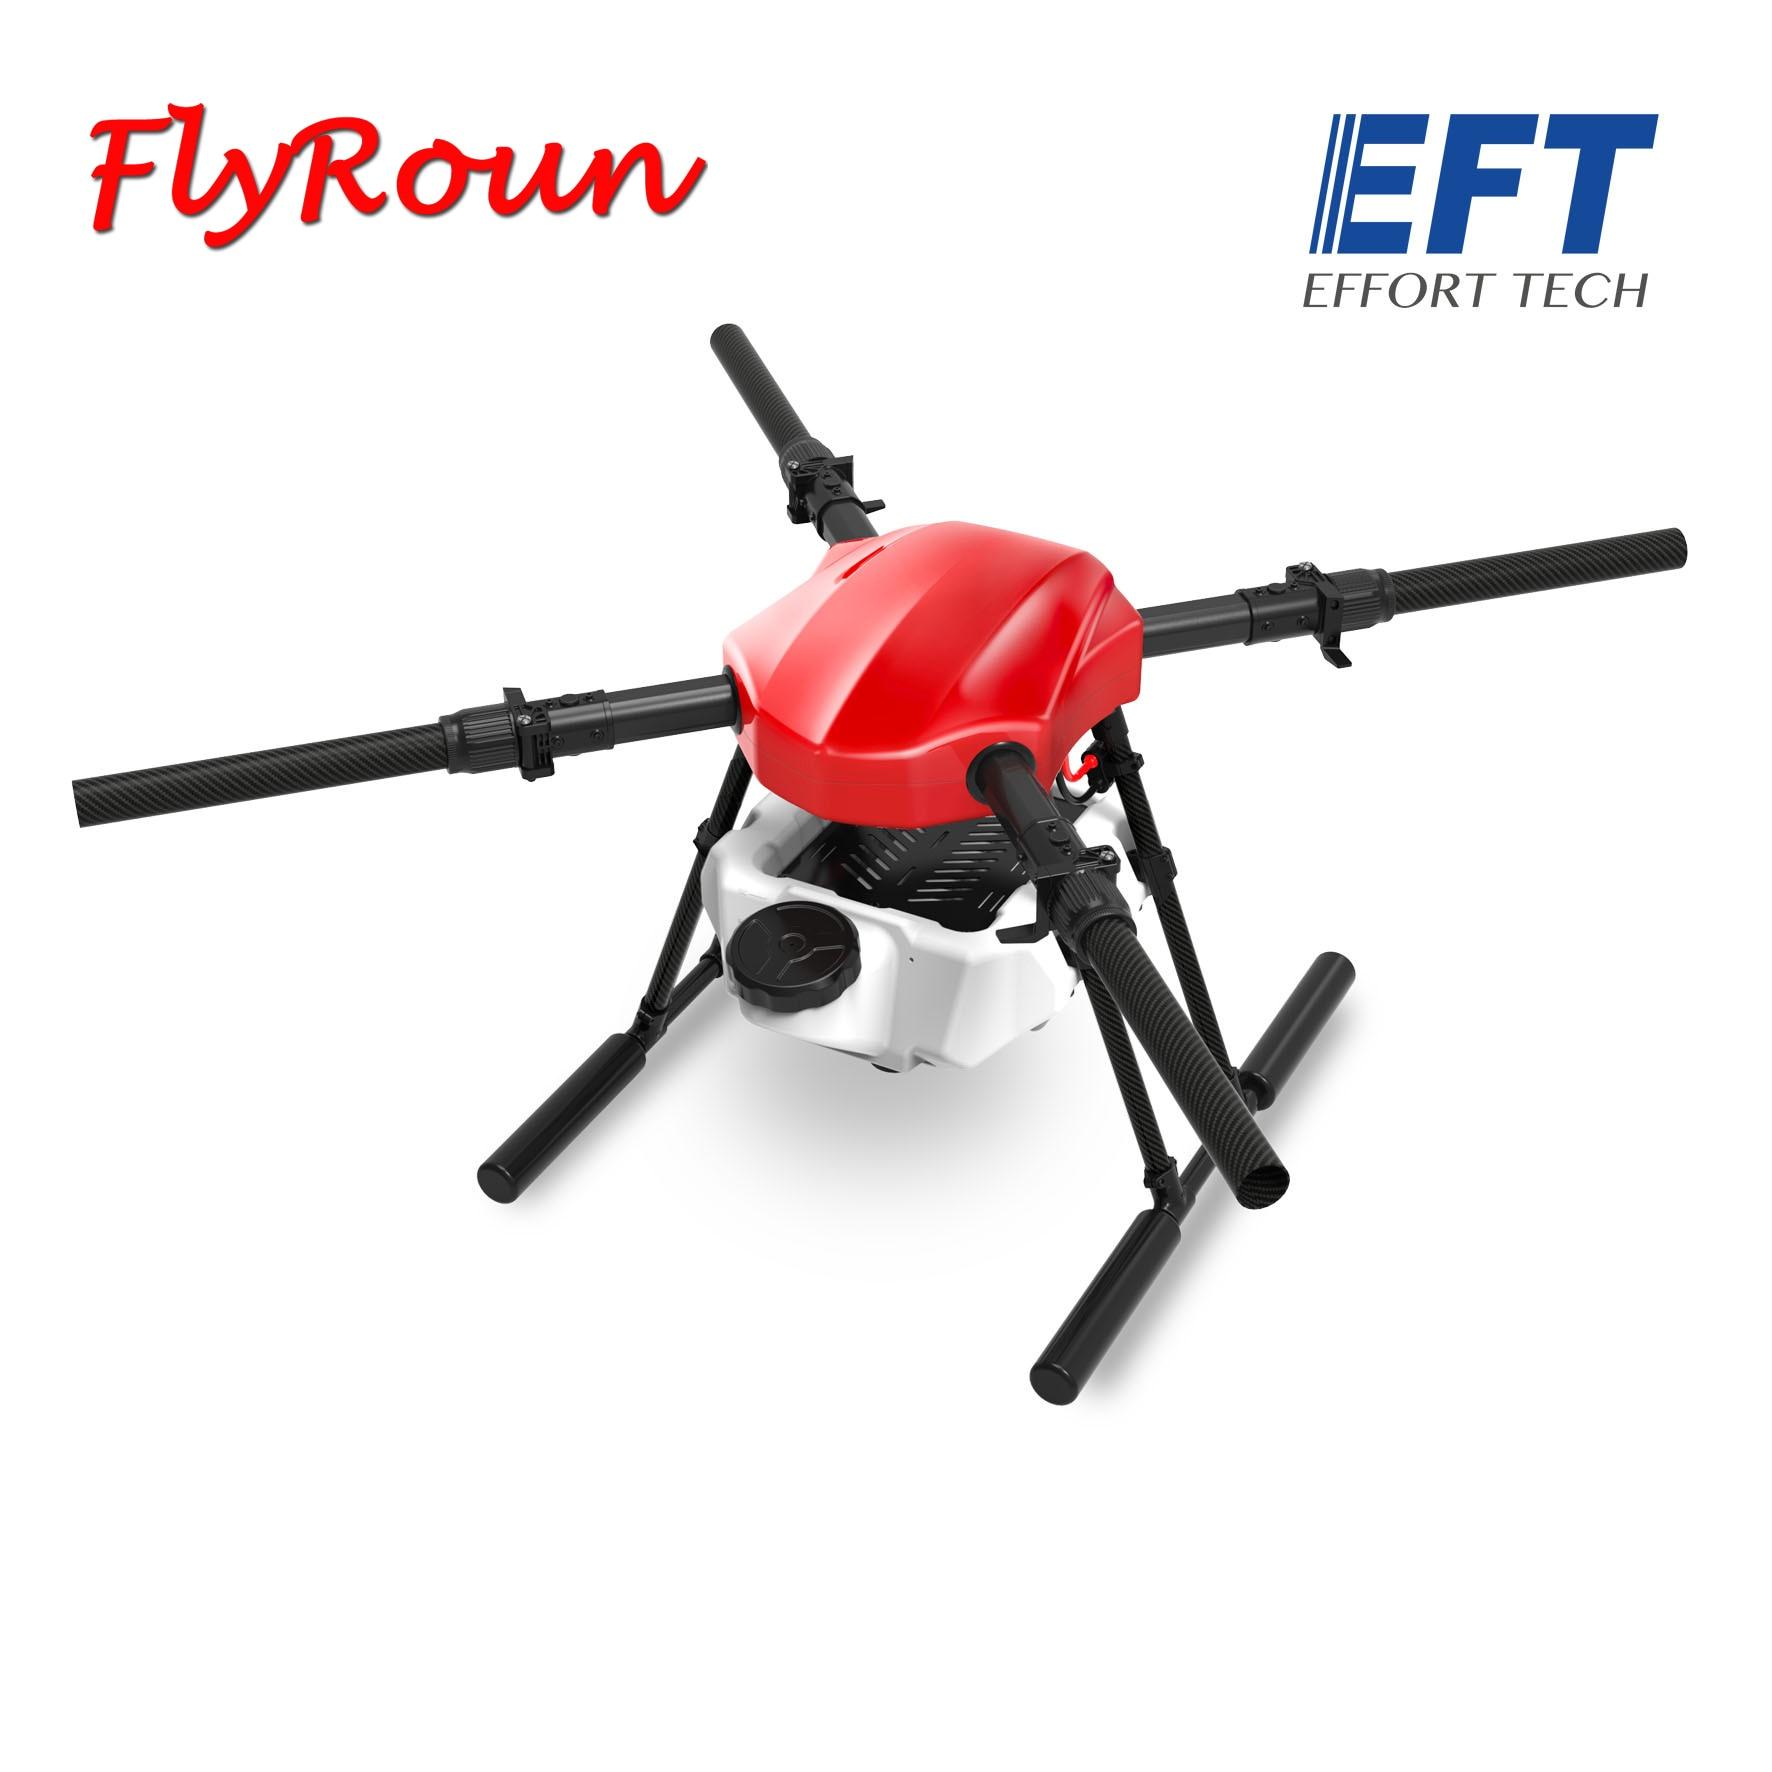 EFT E410S 10L spray plataforma de vuelo 1393mm helicóptero de cuatro hélices a prueba de agua marco plegable DIY kit para agricultura/desinfección drone